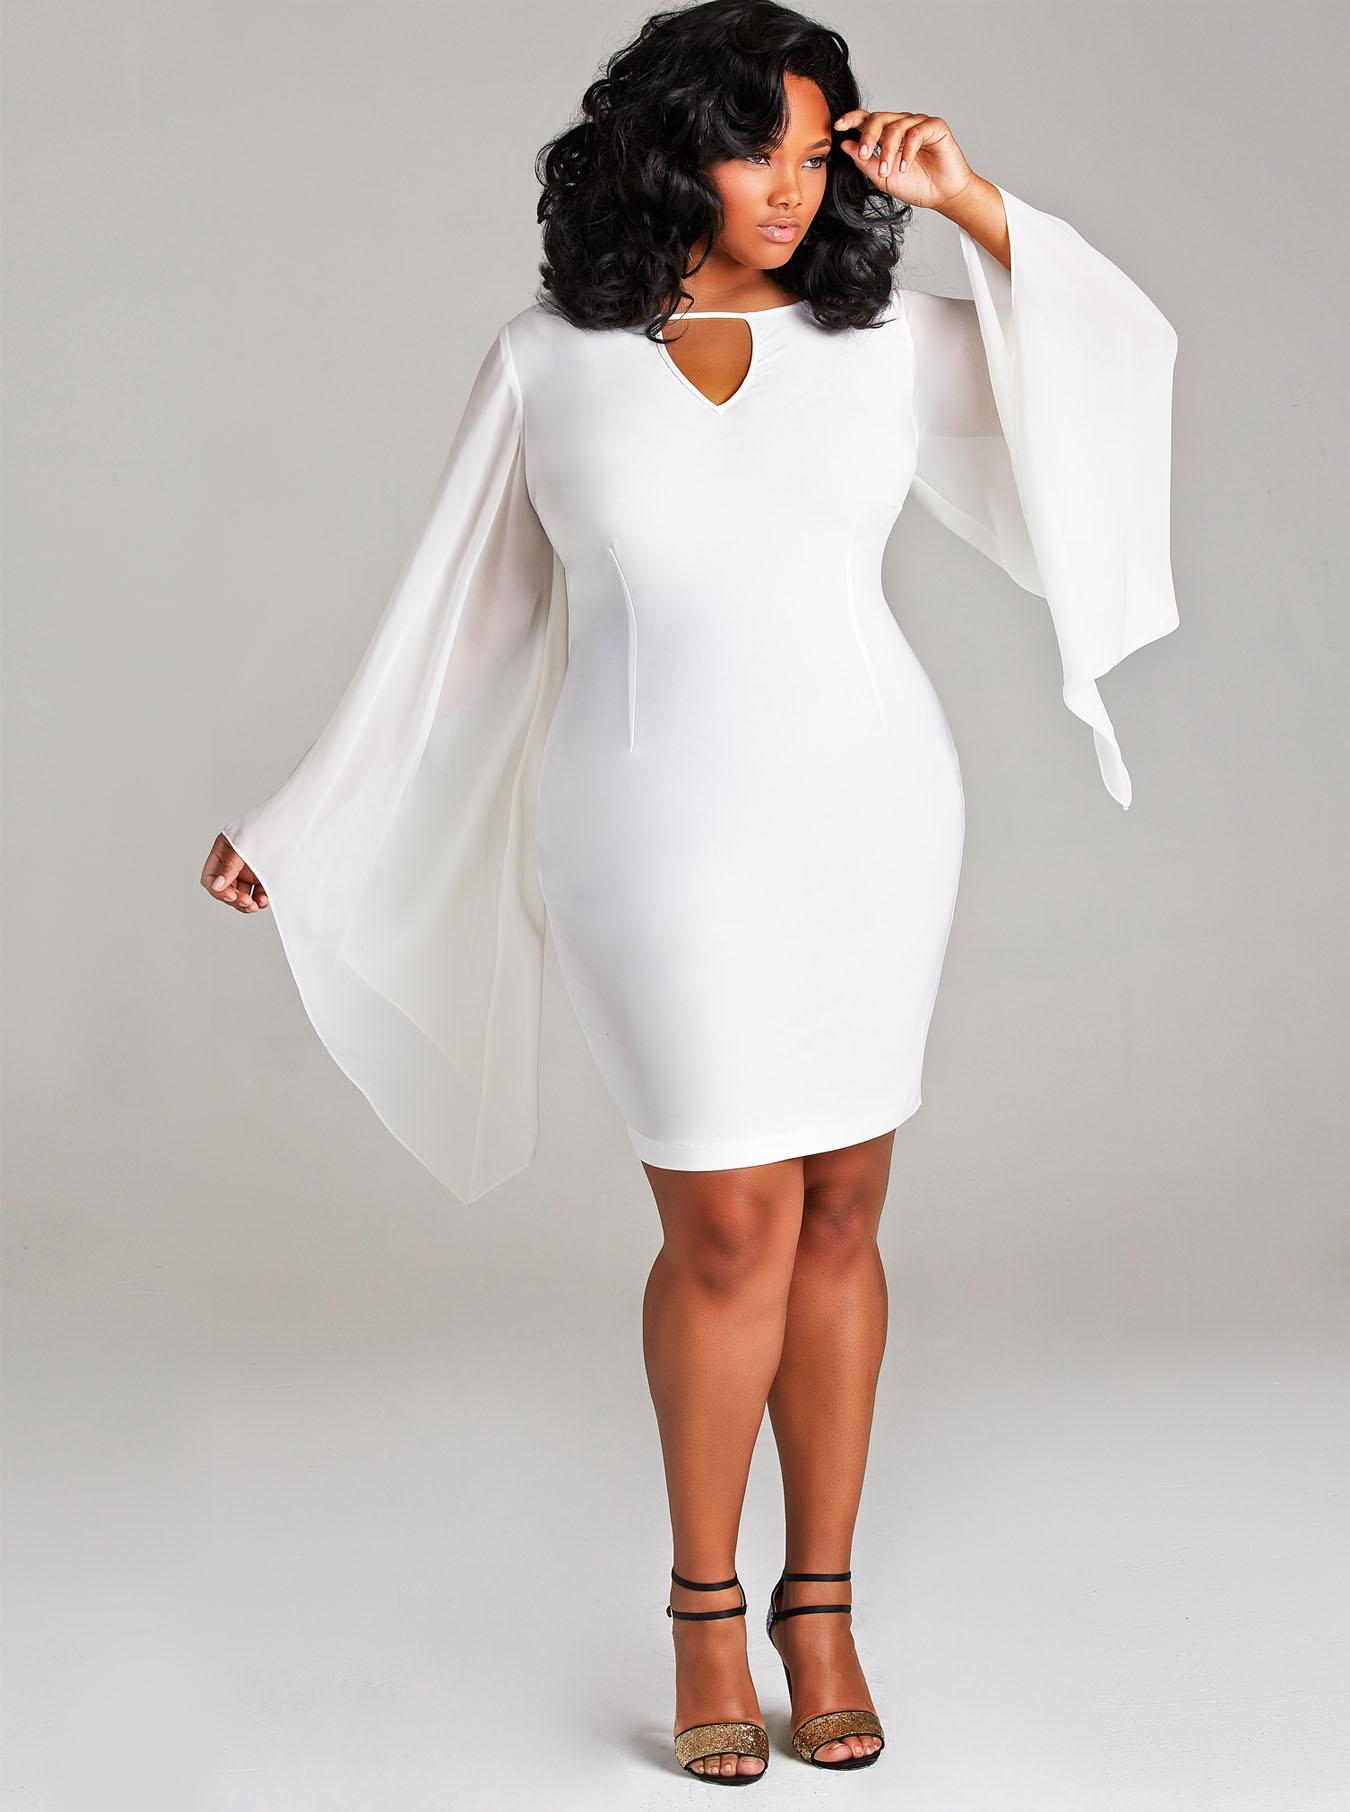 How To Accesorize White Plus Size Dresses Careyfashion